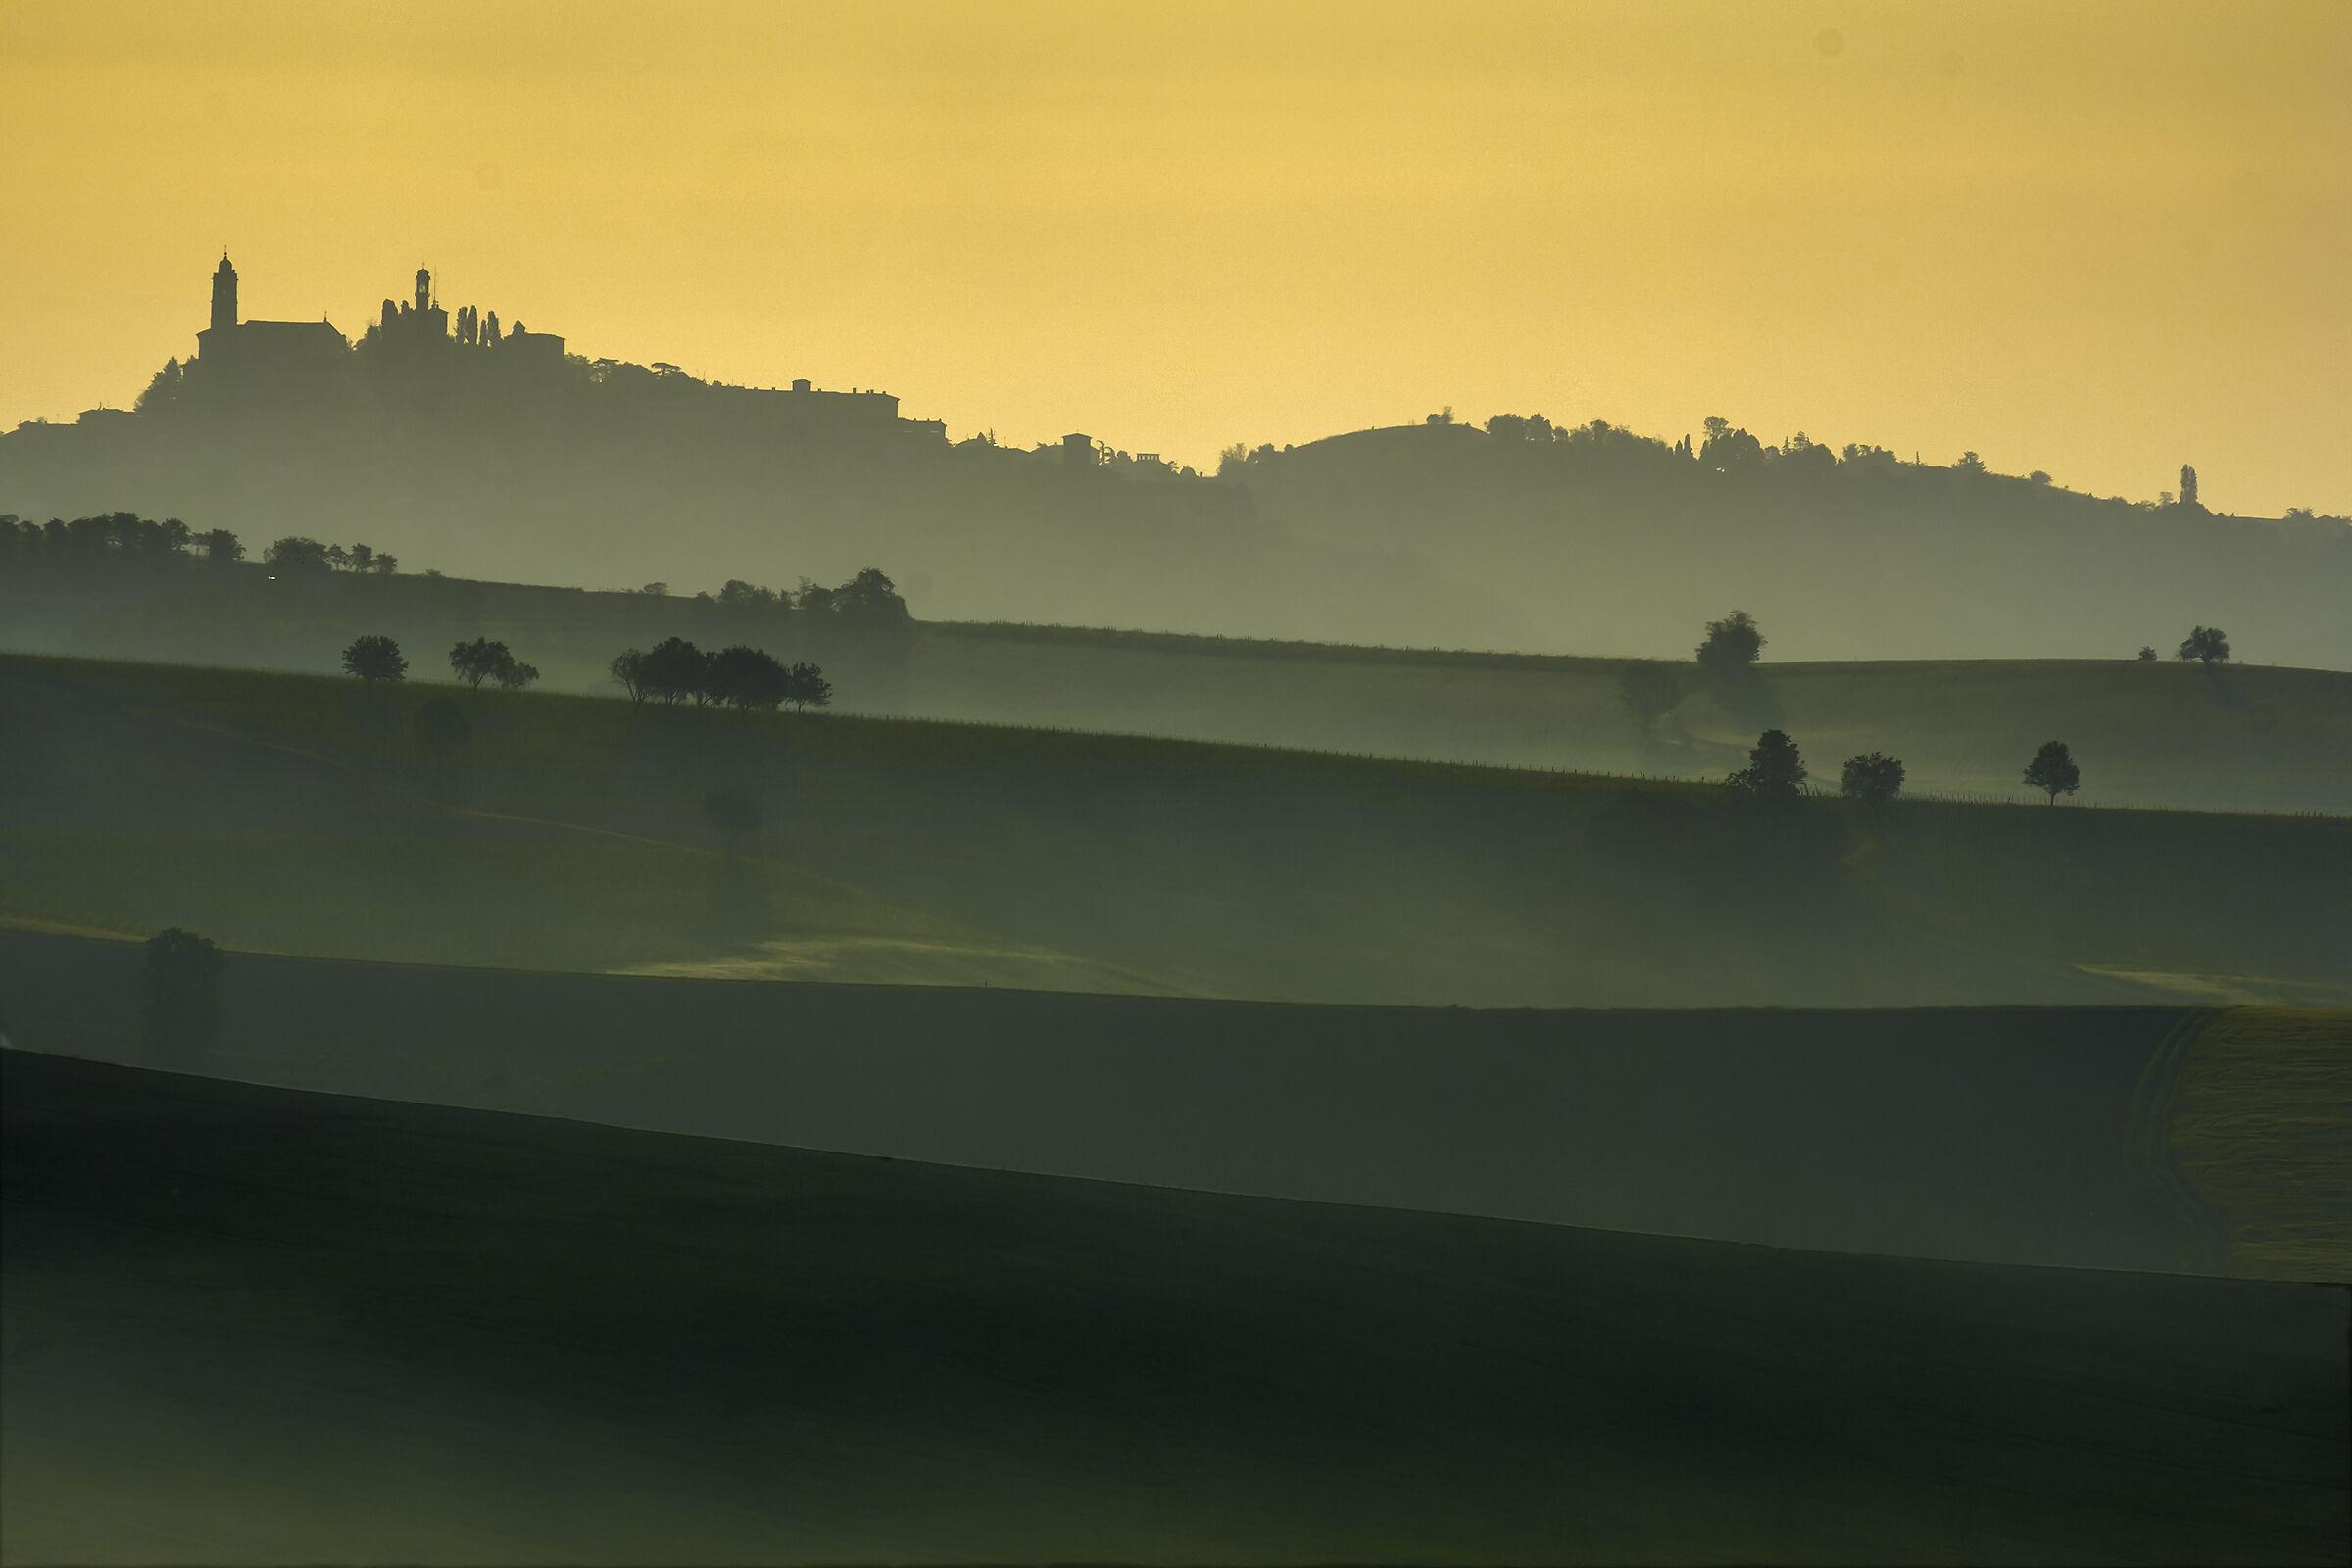 The first lights of dawn illuminate the scene...